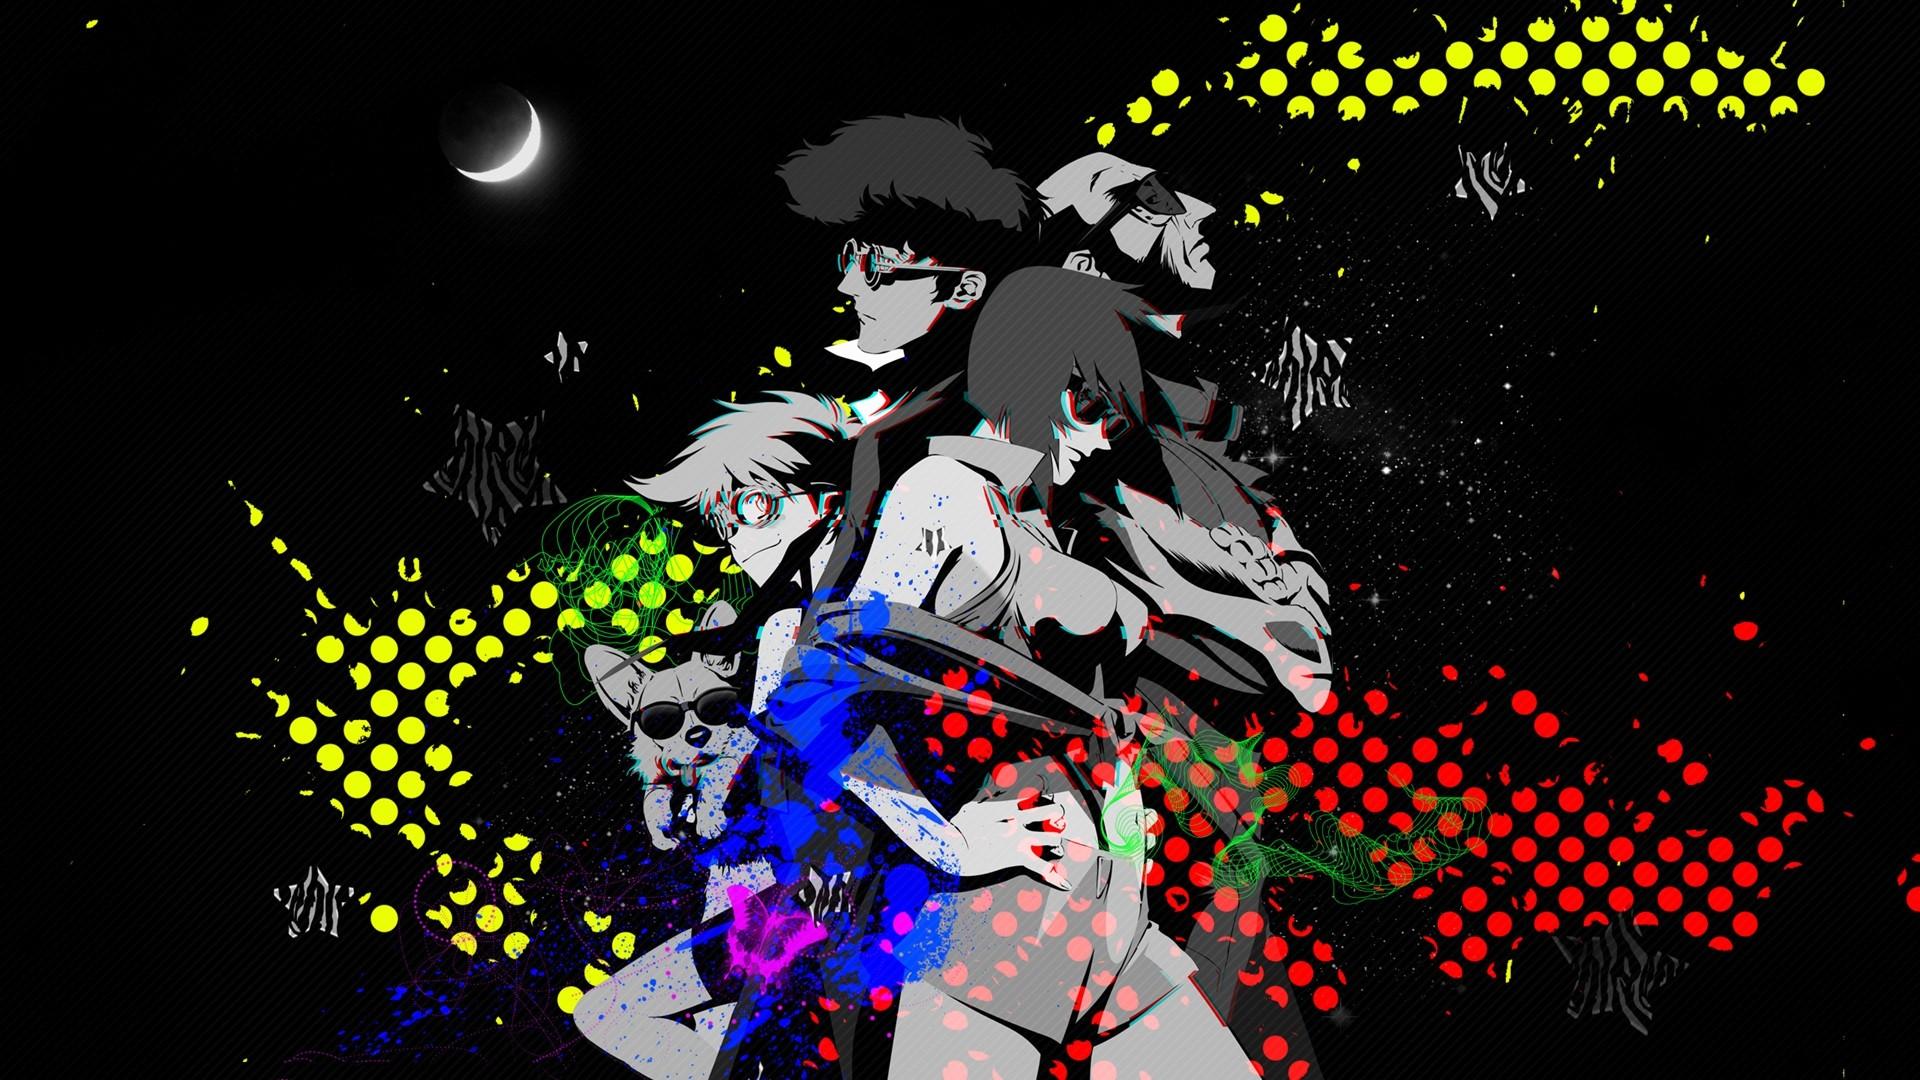 Cowboy Bebop Desktop wallpaper